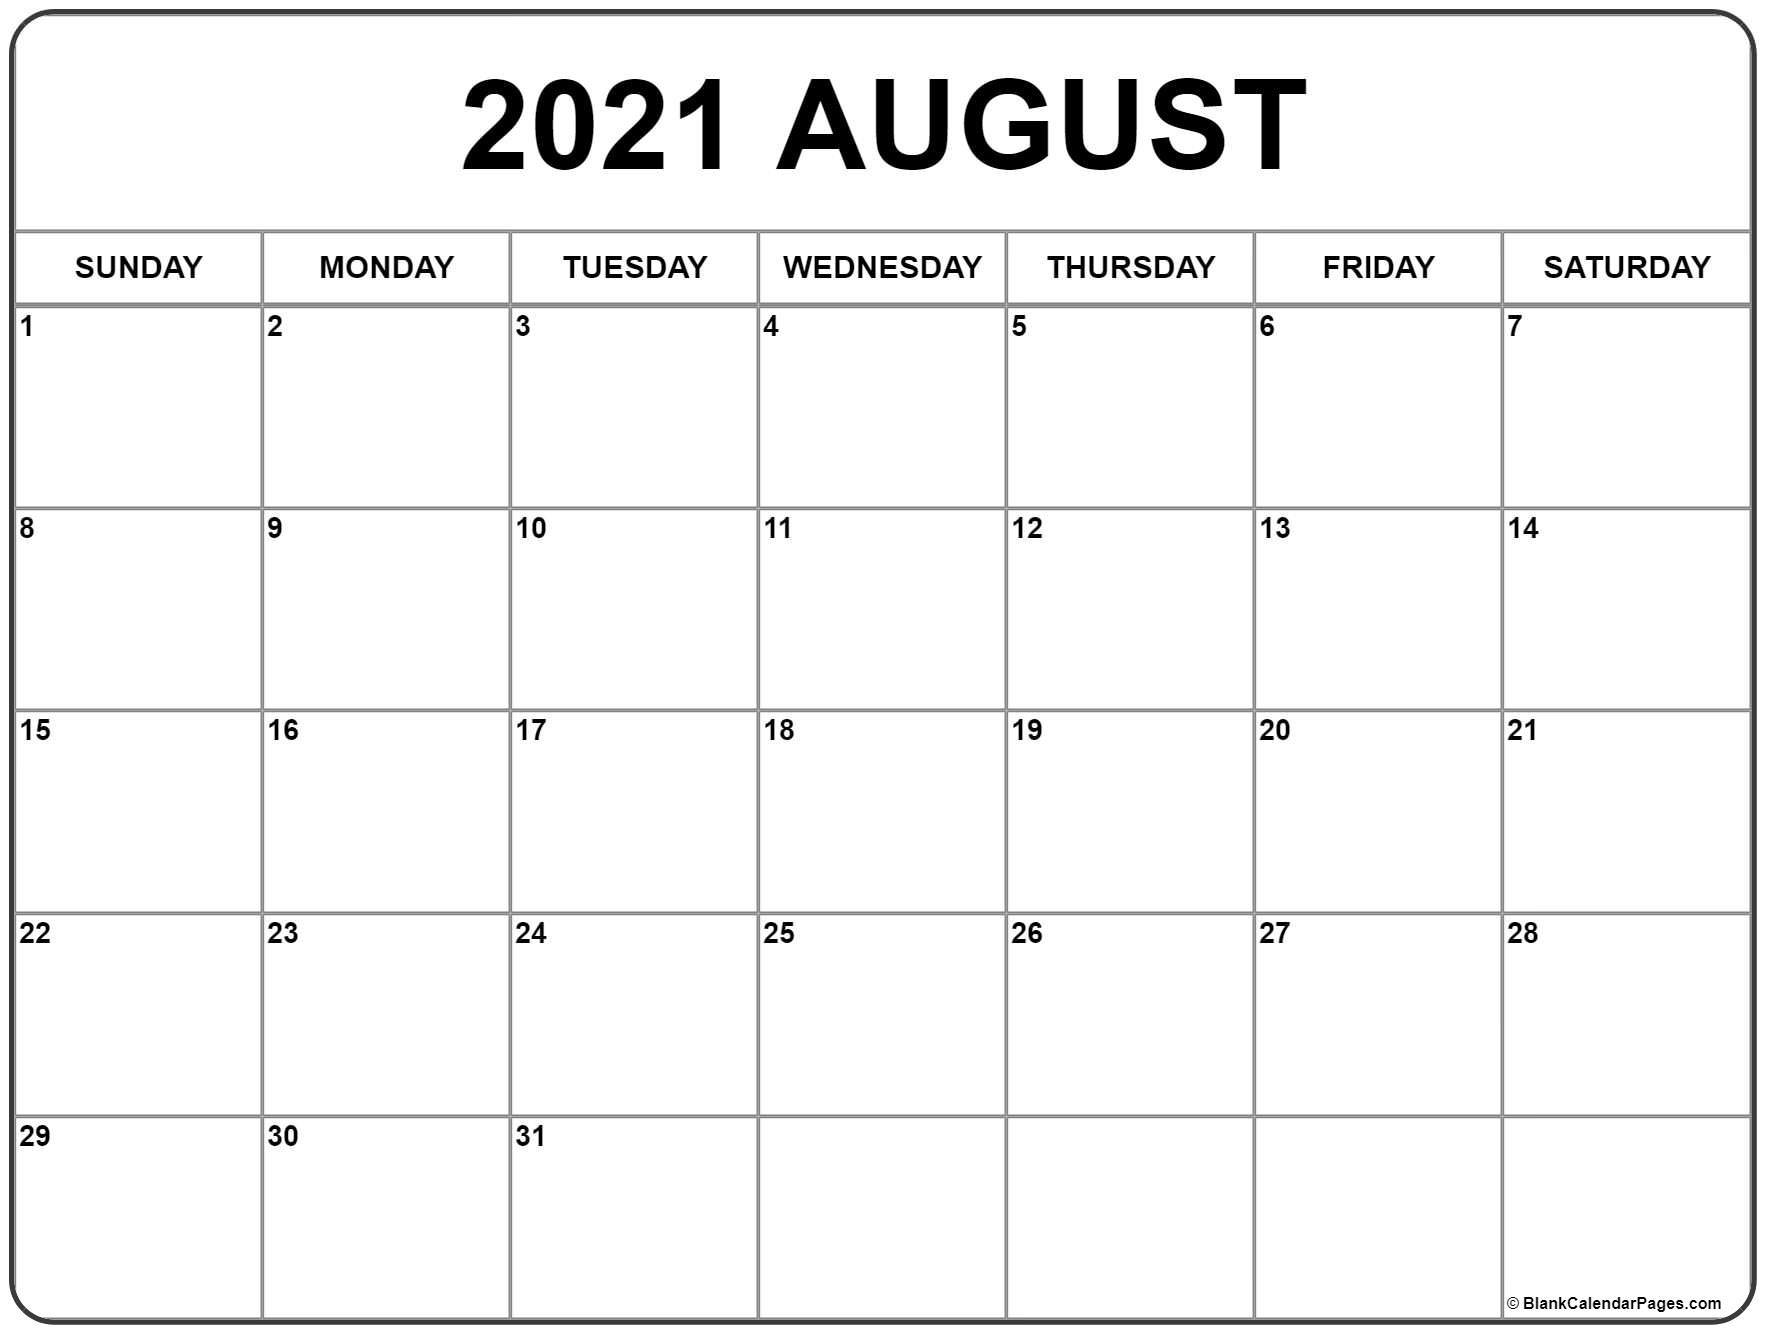 August 2021 Calendar | Free Printable Monthly Calendars  Free Monthly Calendar Template 2021